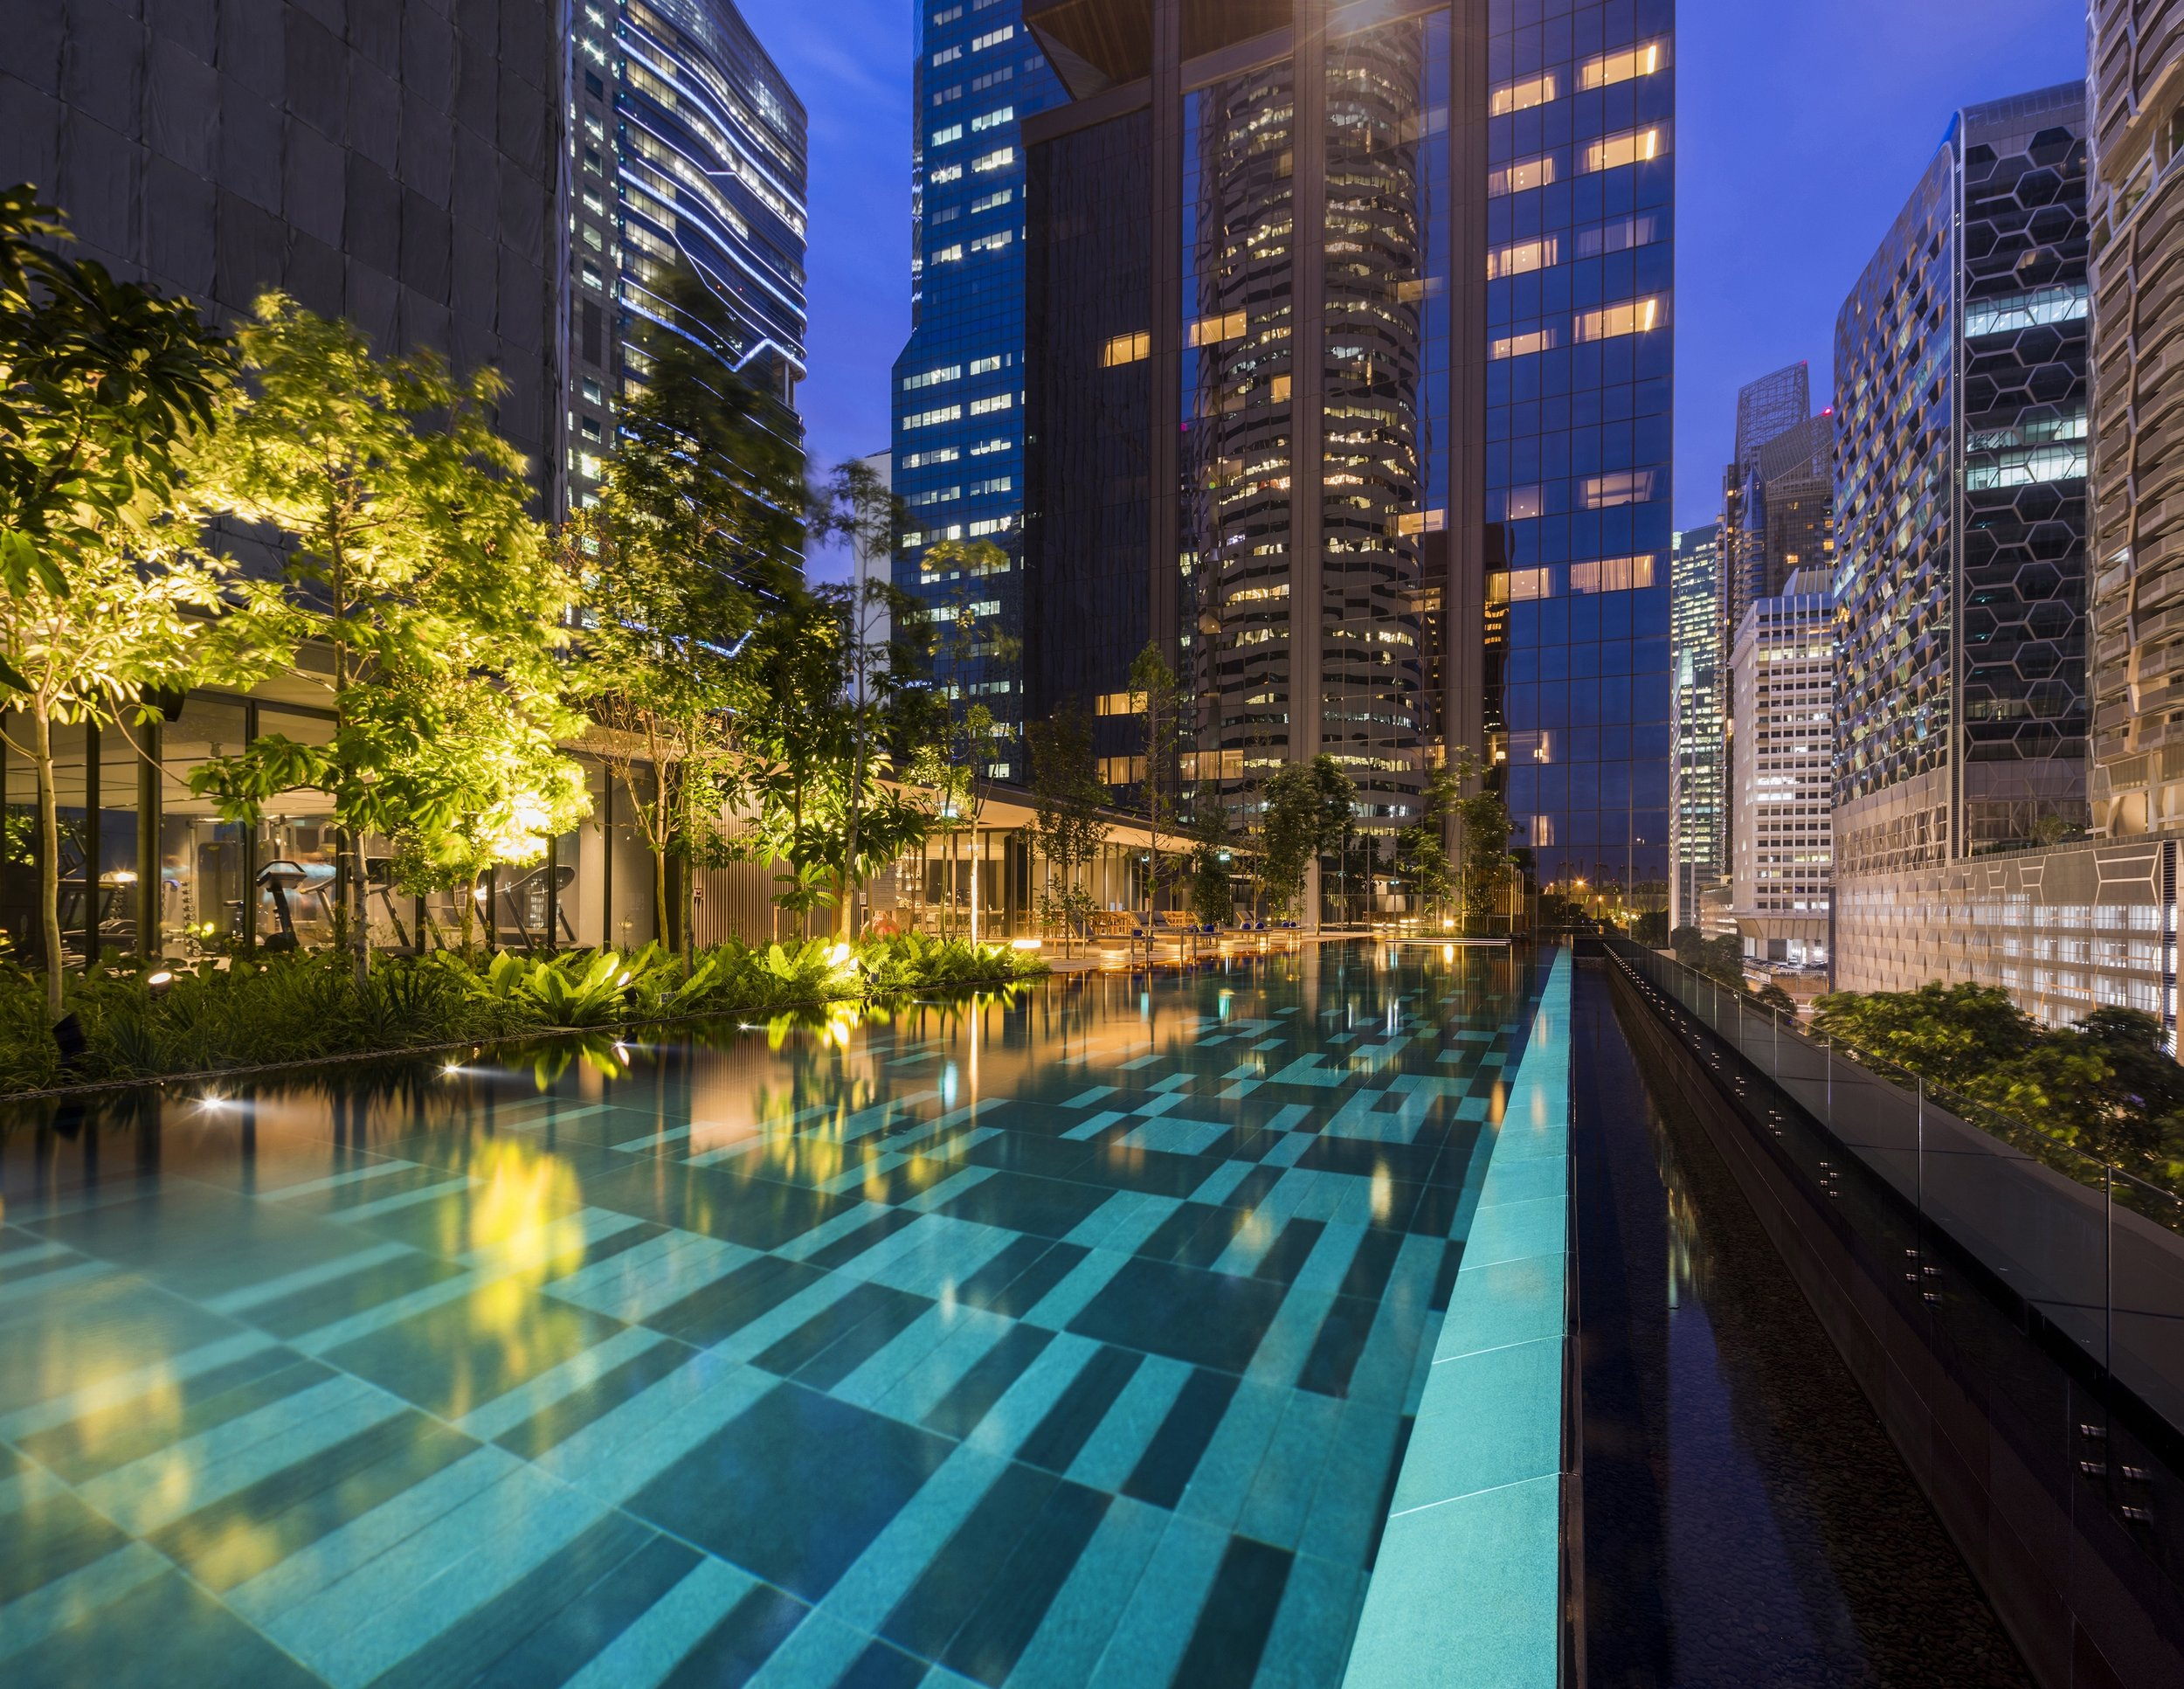 Outdoor Infinity Pool 2.jpg